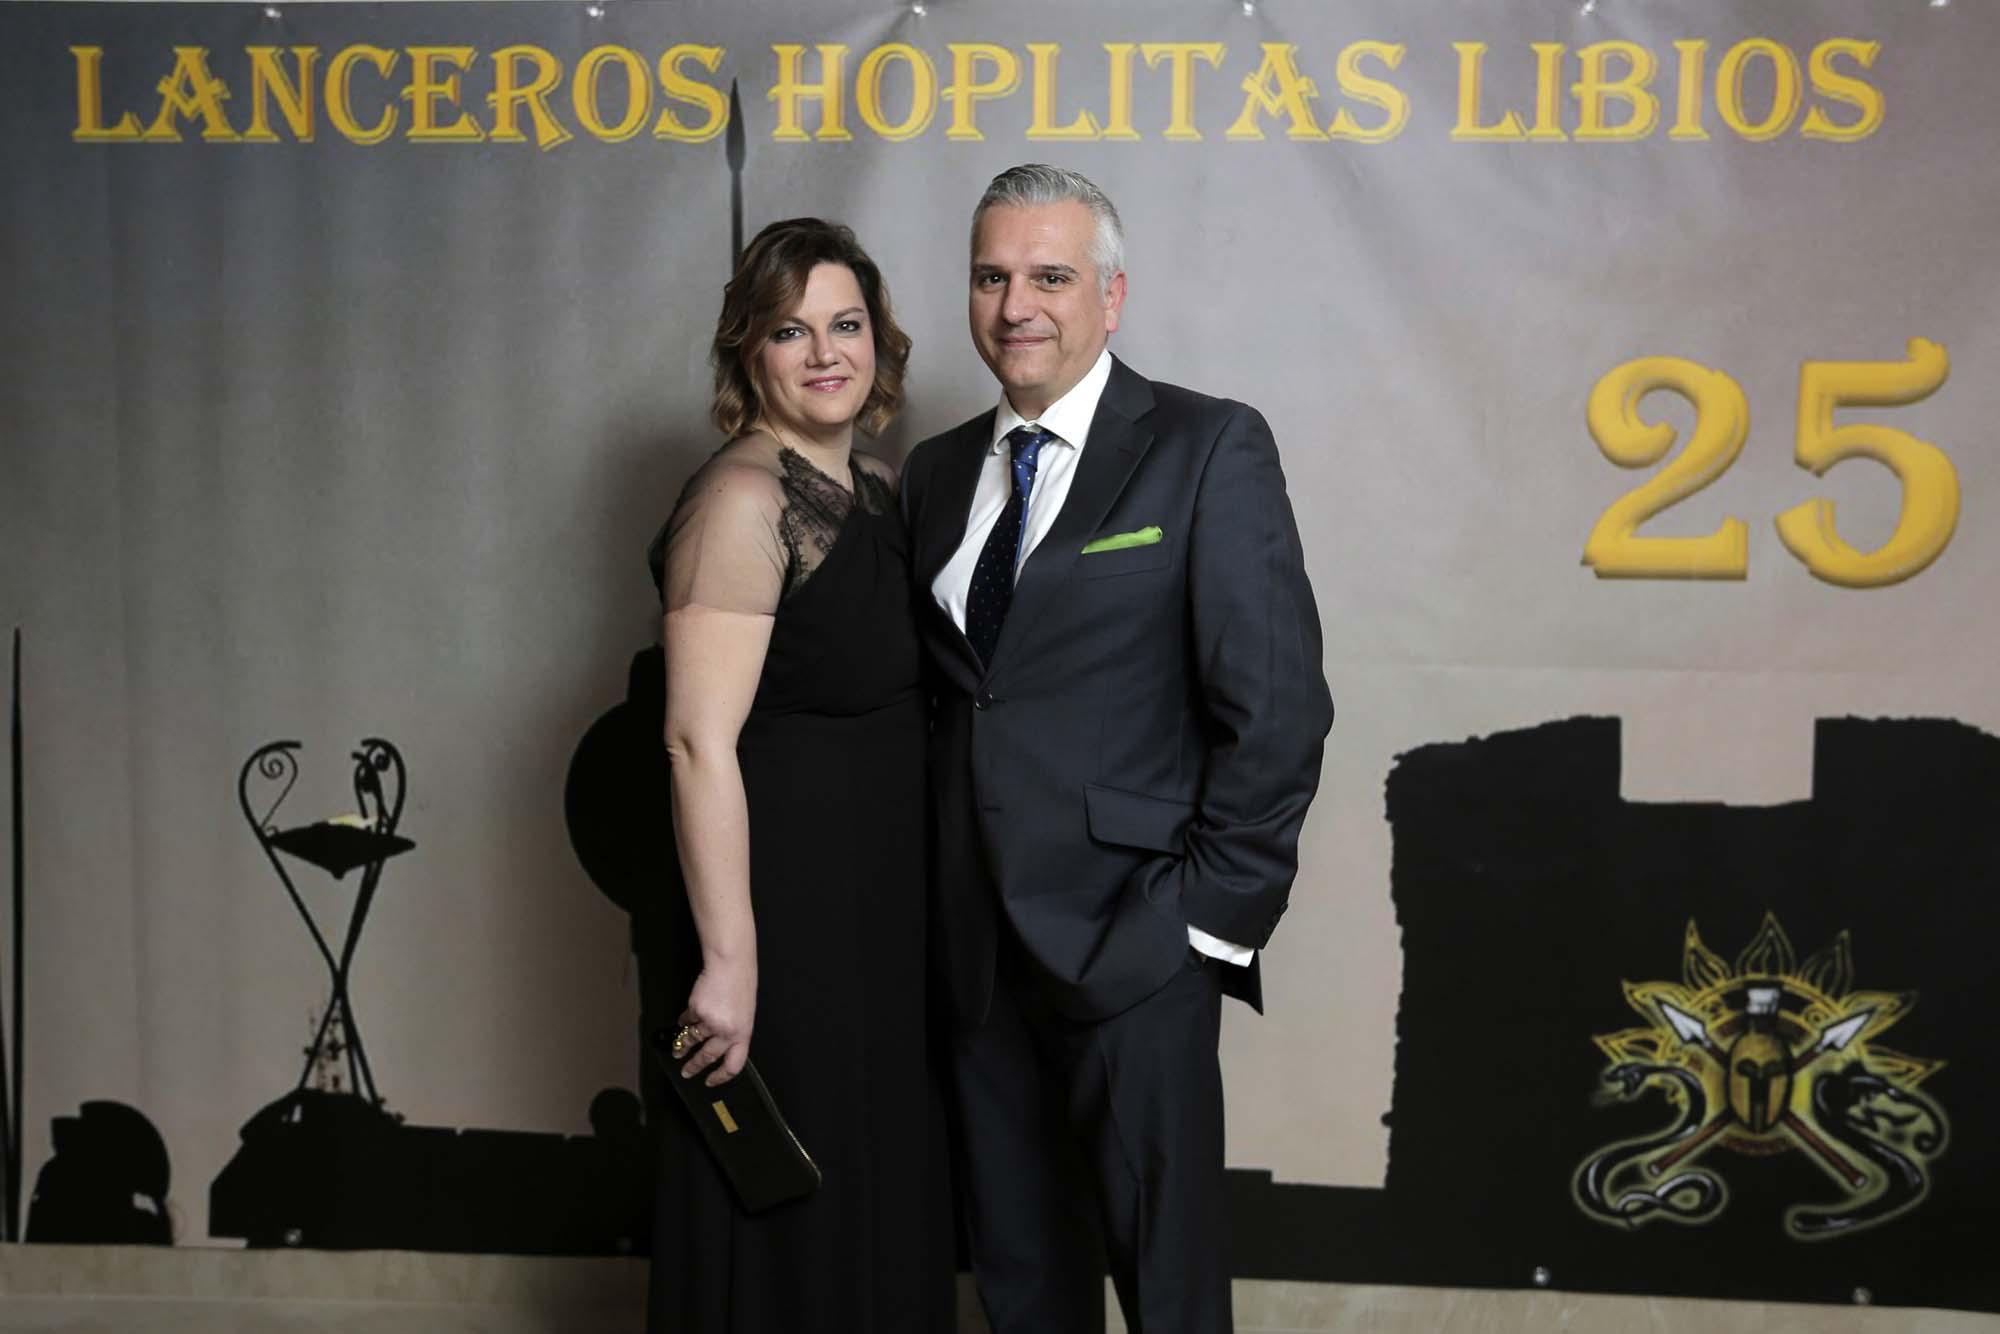 Lanceros Hoplitas Libios  (231)